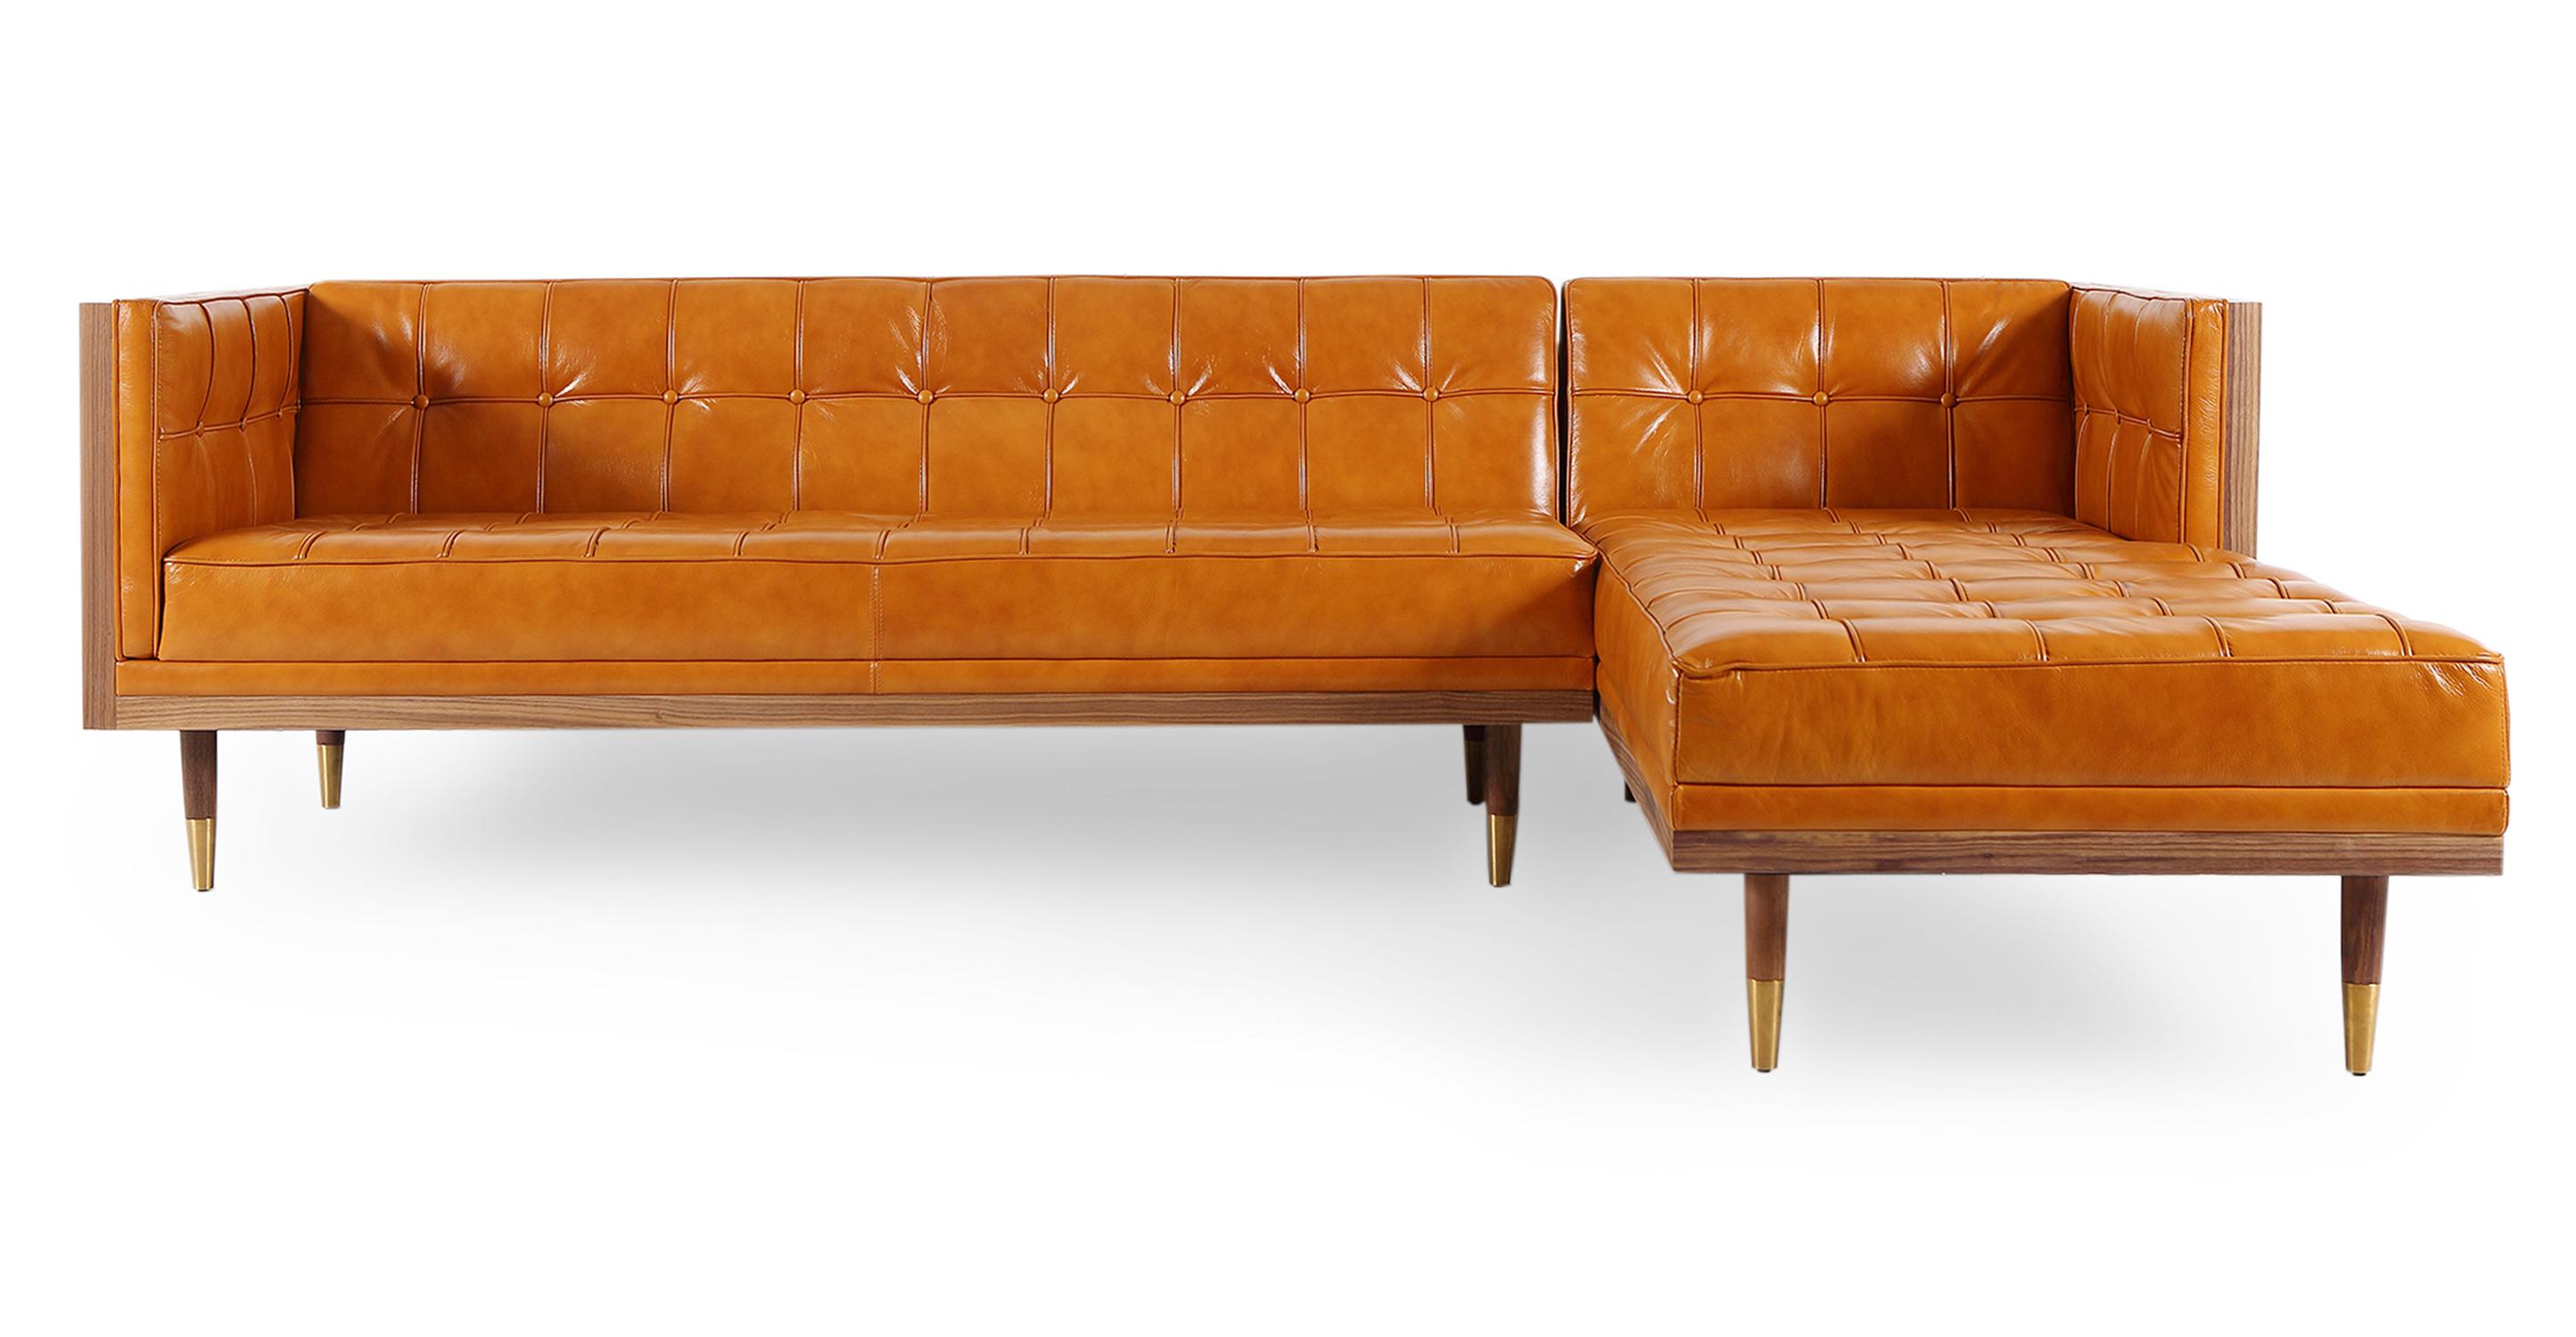 "Woodrow Box 100"" Leather Sofa Sectional Right, Walnut/Tan Aniline"